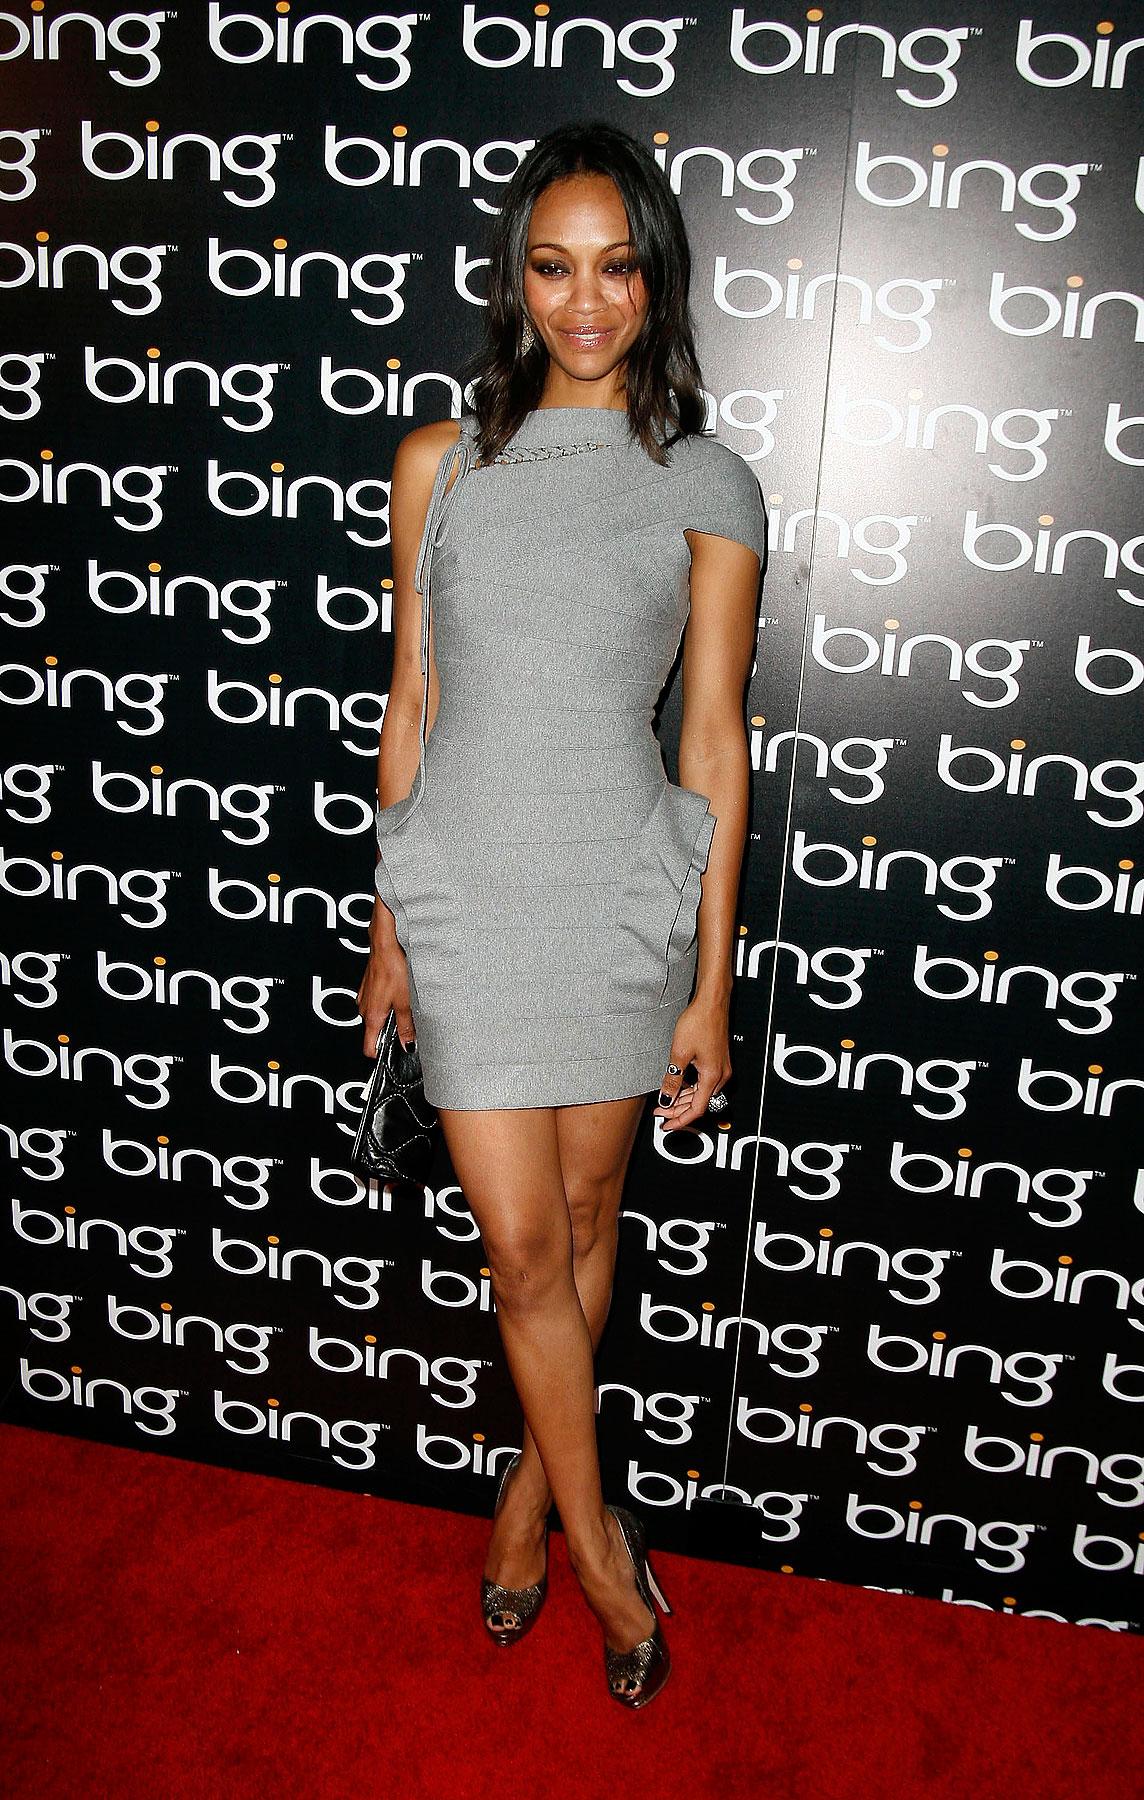 Zoe Saldana FTWs Bing's Celebration Of Creative Minds (PHOTOS)